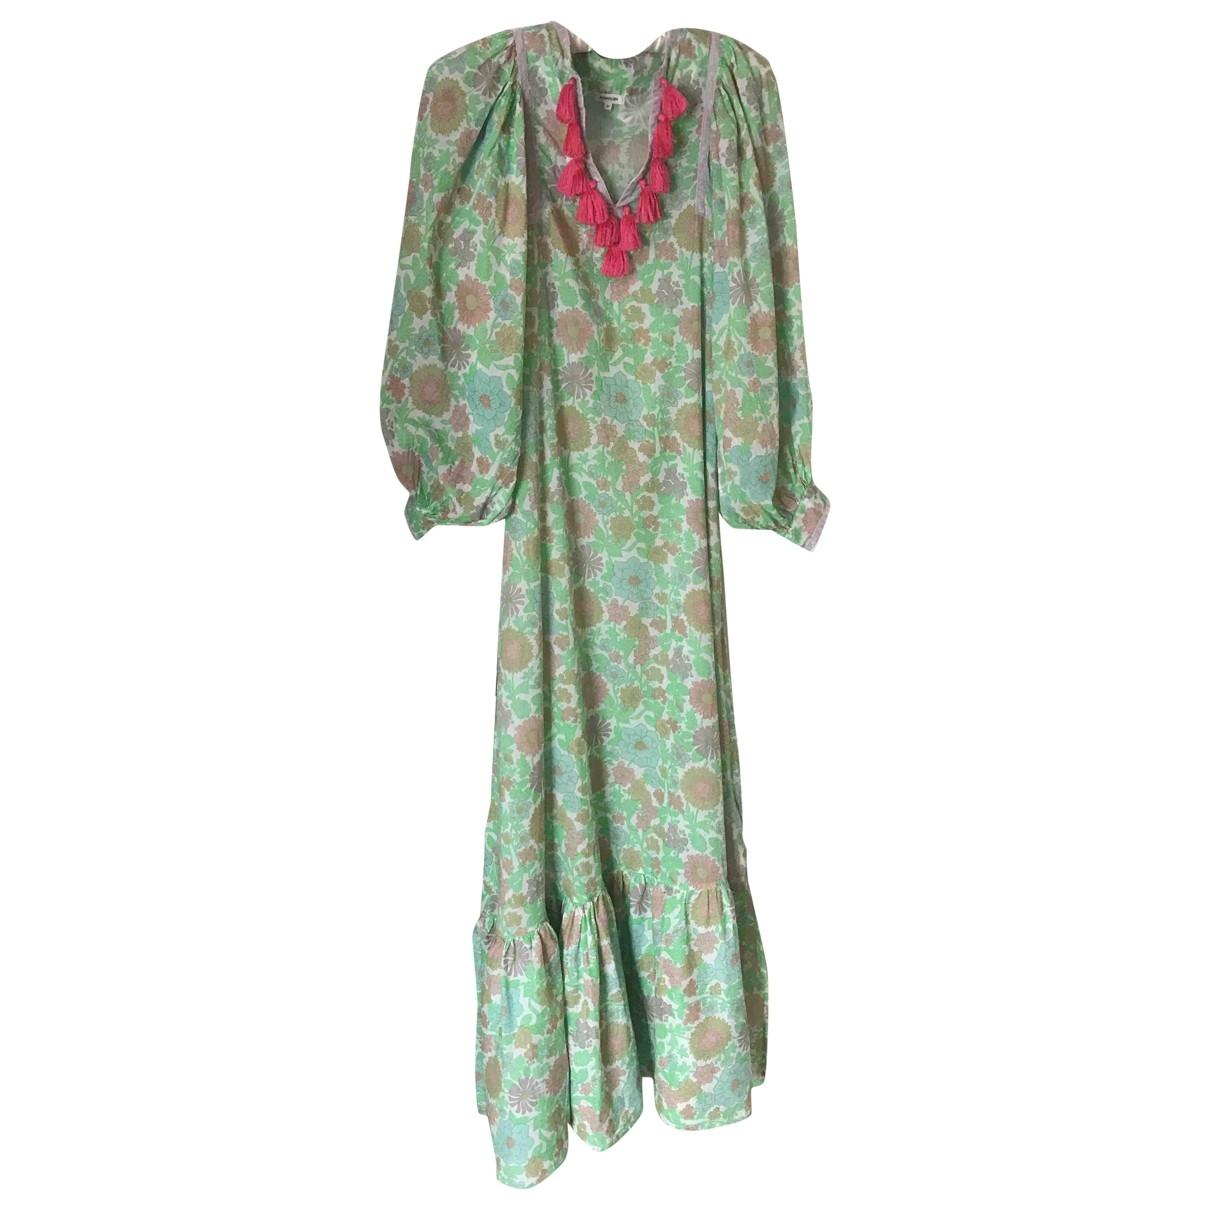 Manoush \N Kleid in  Gruen Baumwolle